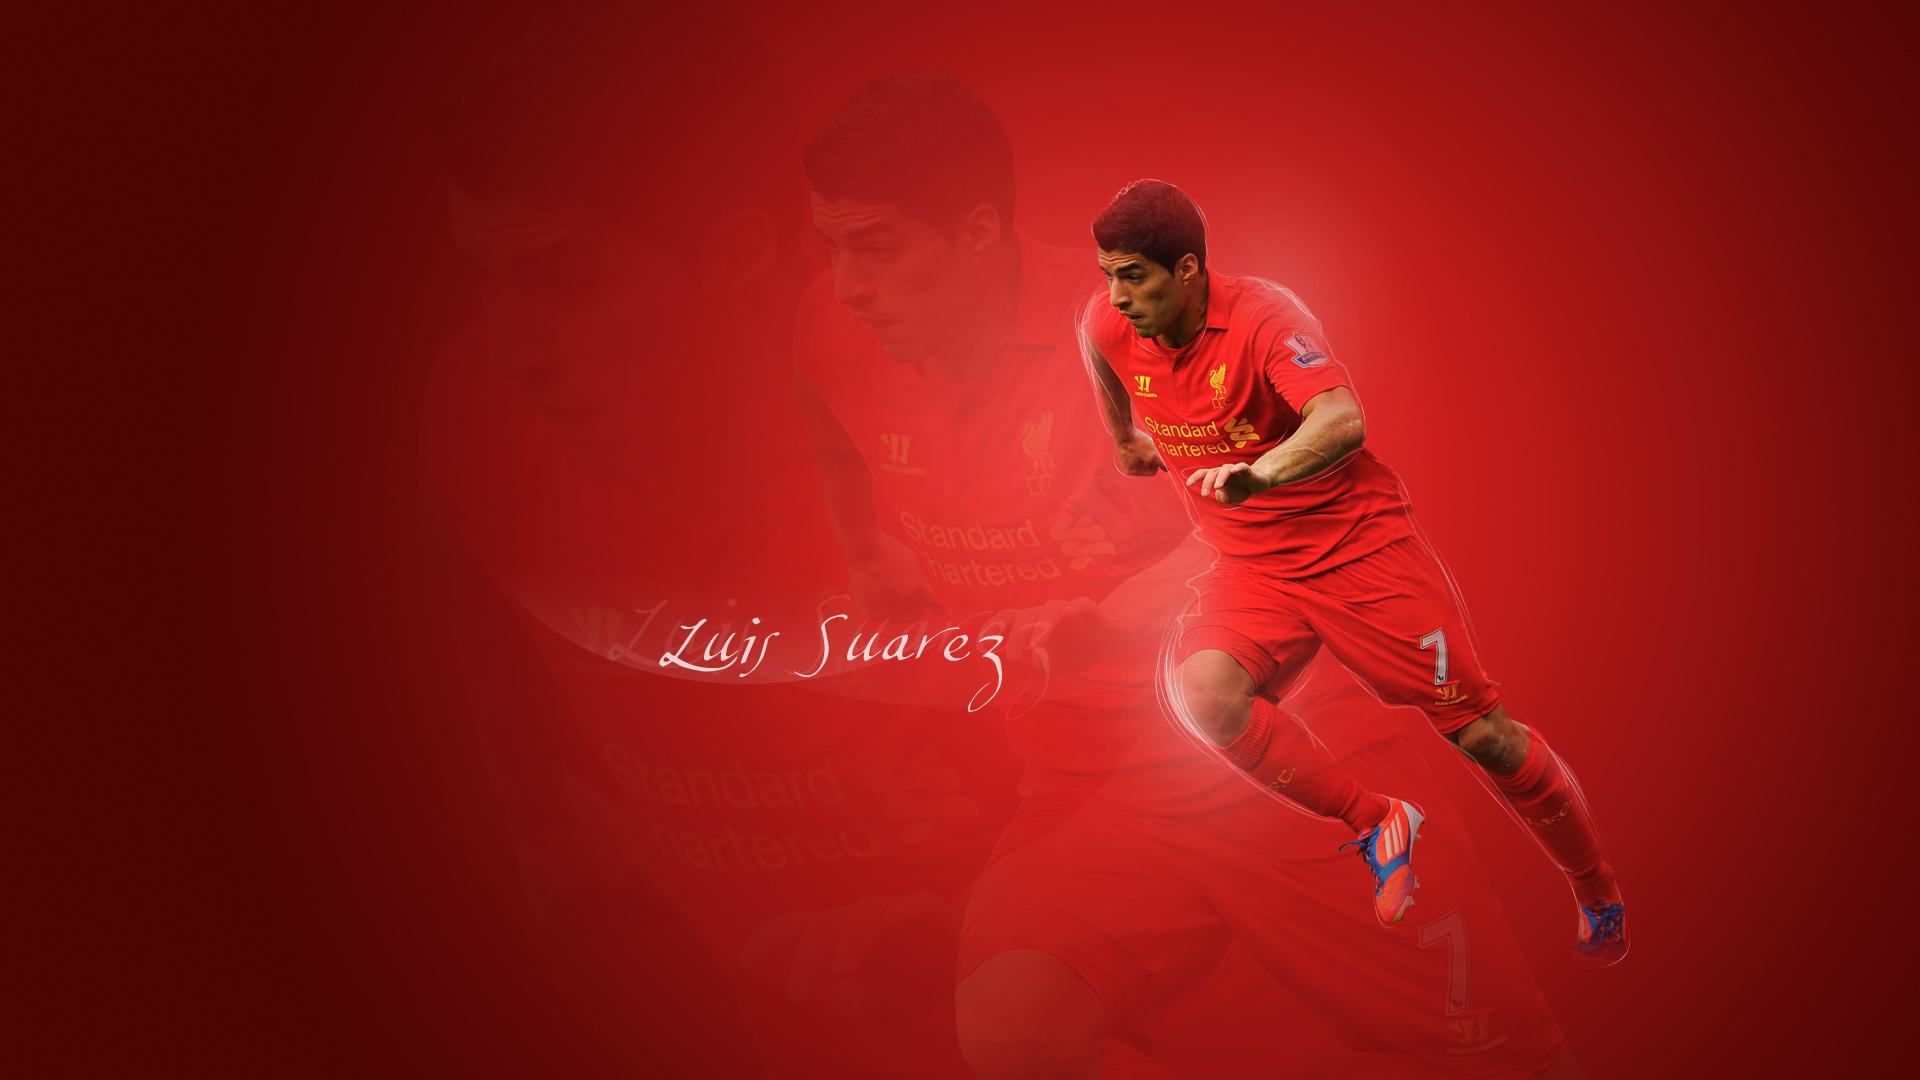 Luis Suarez 2014 Liverpool Wallpaper   Football HD Wallpapers 1920x1080